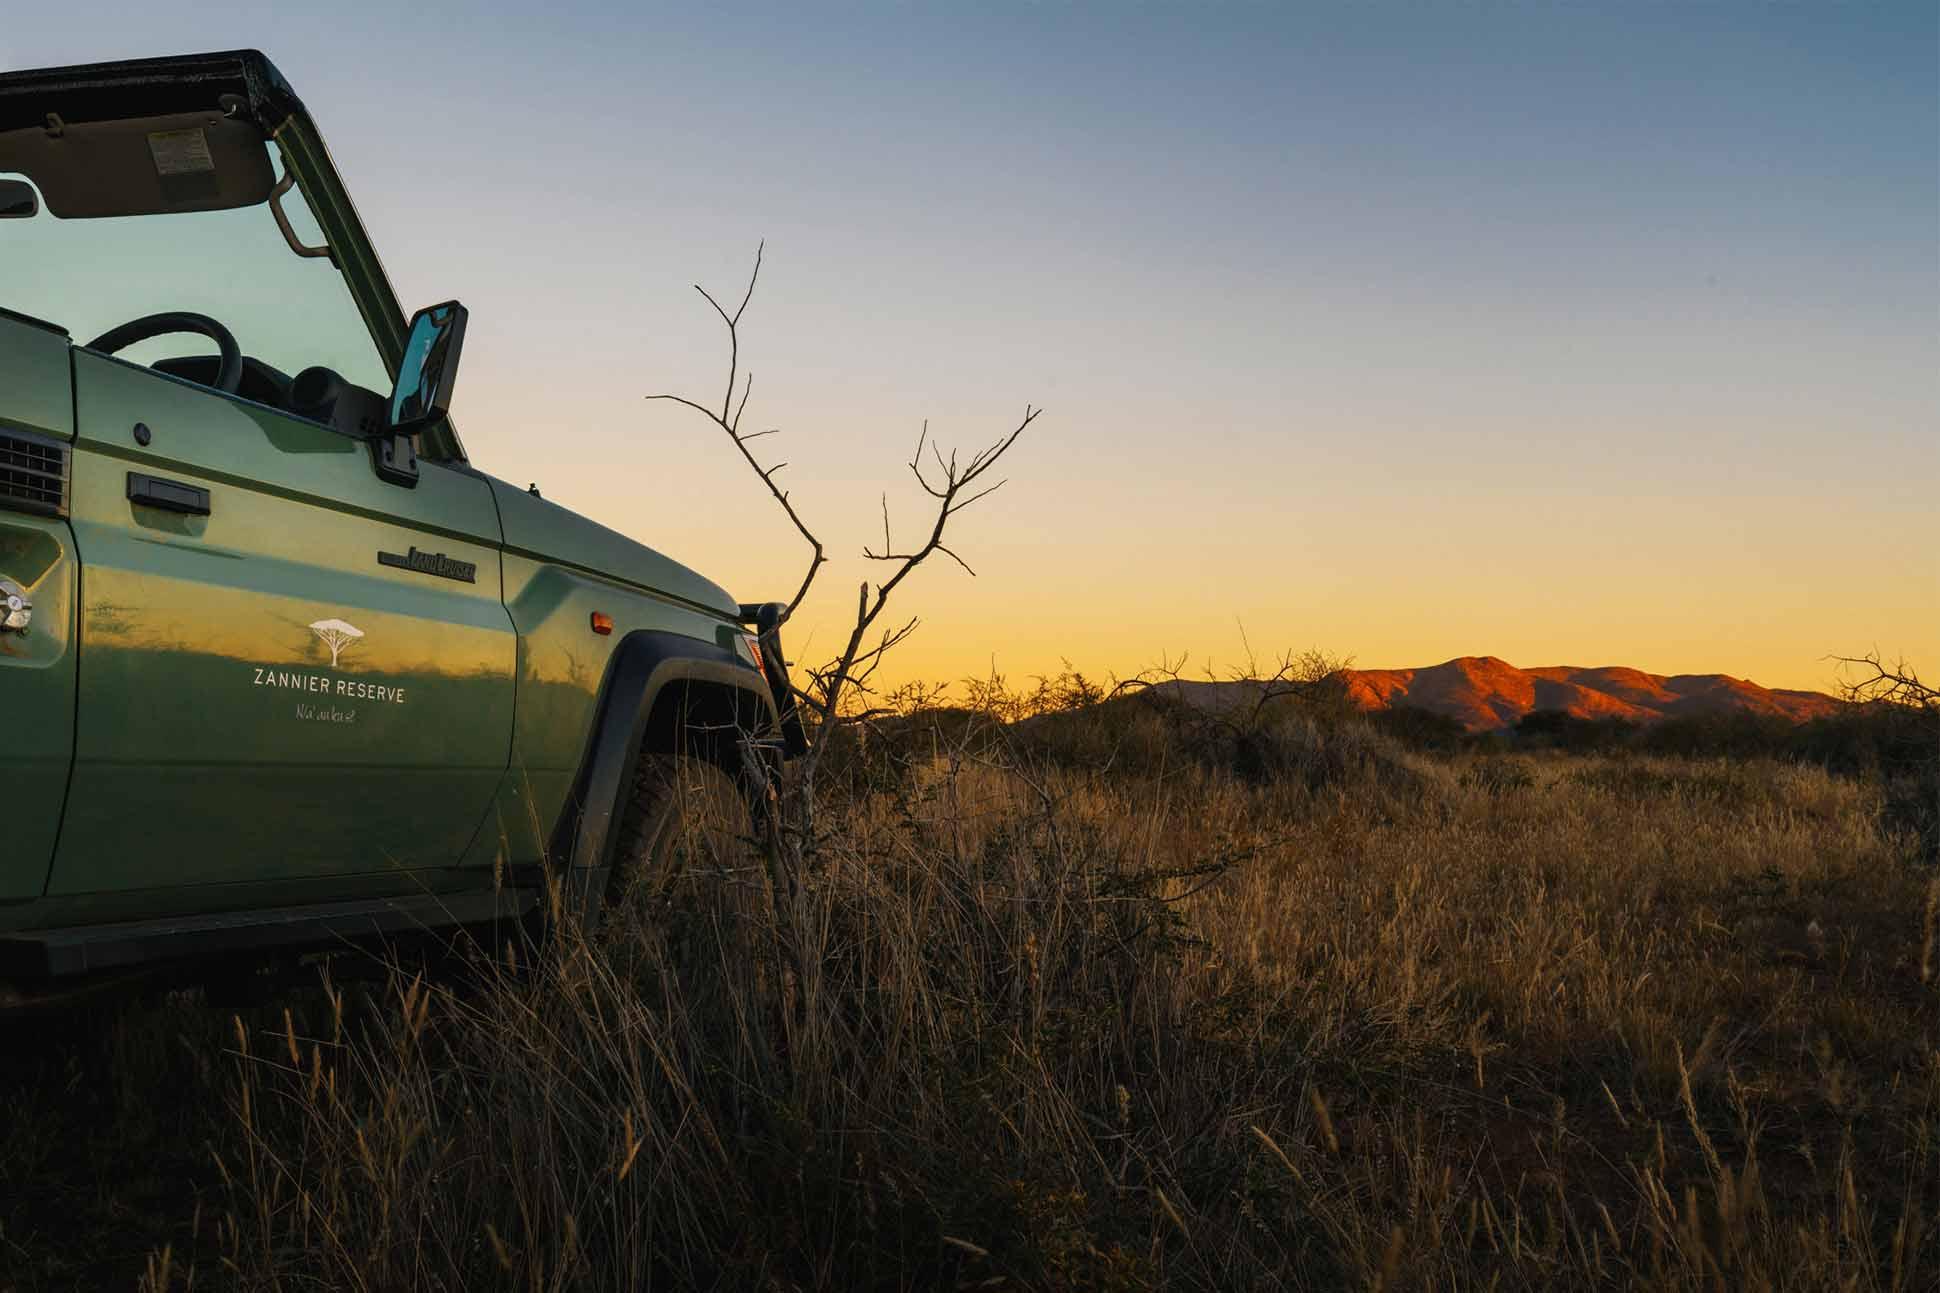 Zannier Hotels Omaanda continues Rhino Rangers programme: <br> Bush patrol